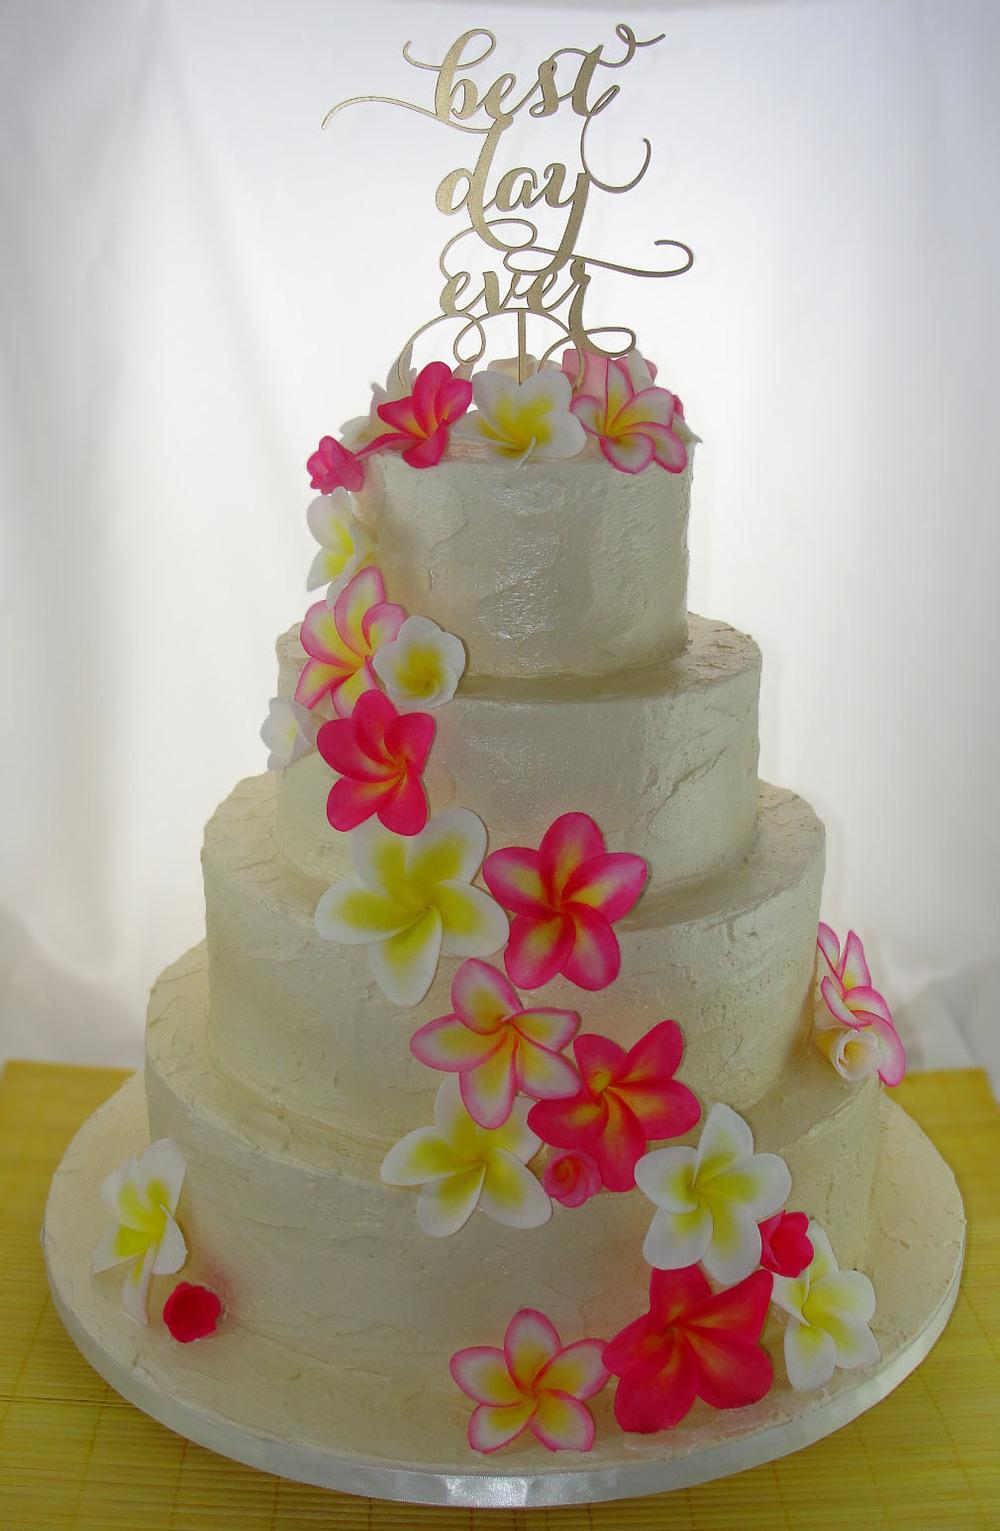 LBC 1408 - Plumeria Wedding Cake.jpg